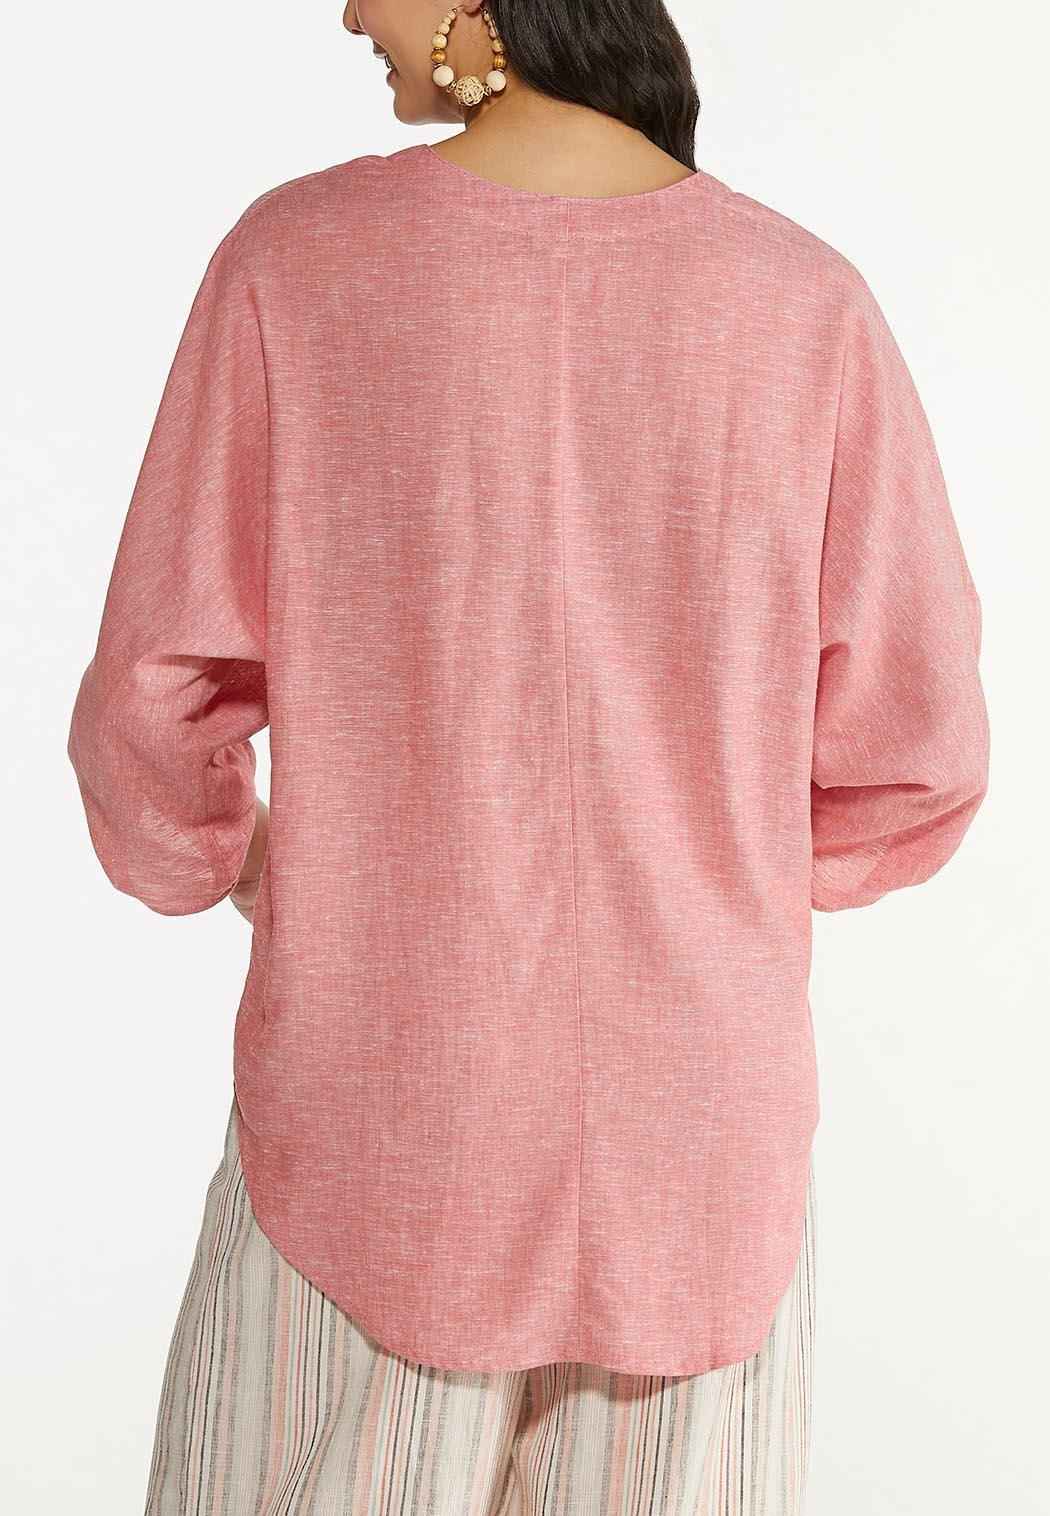 Coral Linen Top (Item #44578997)